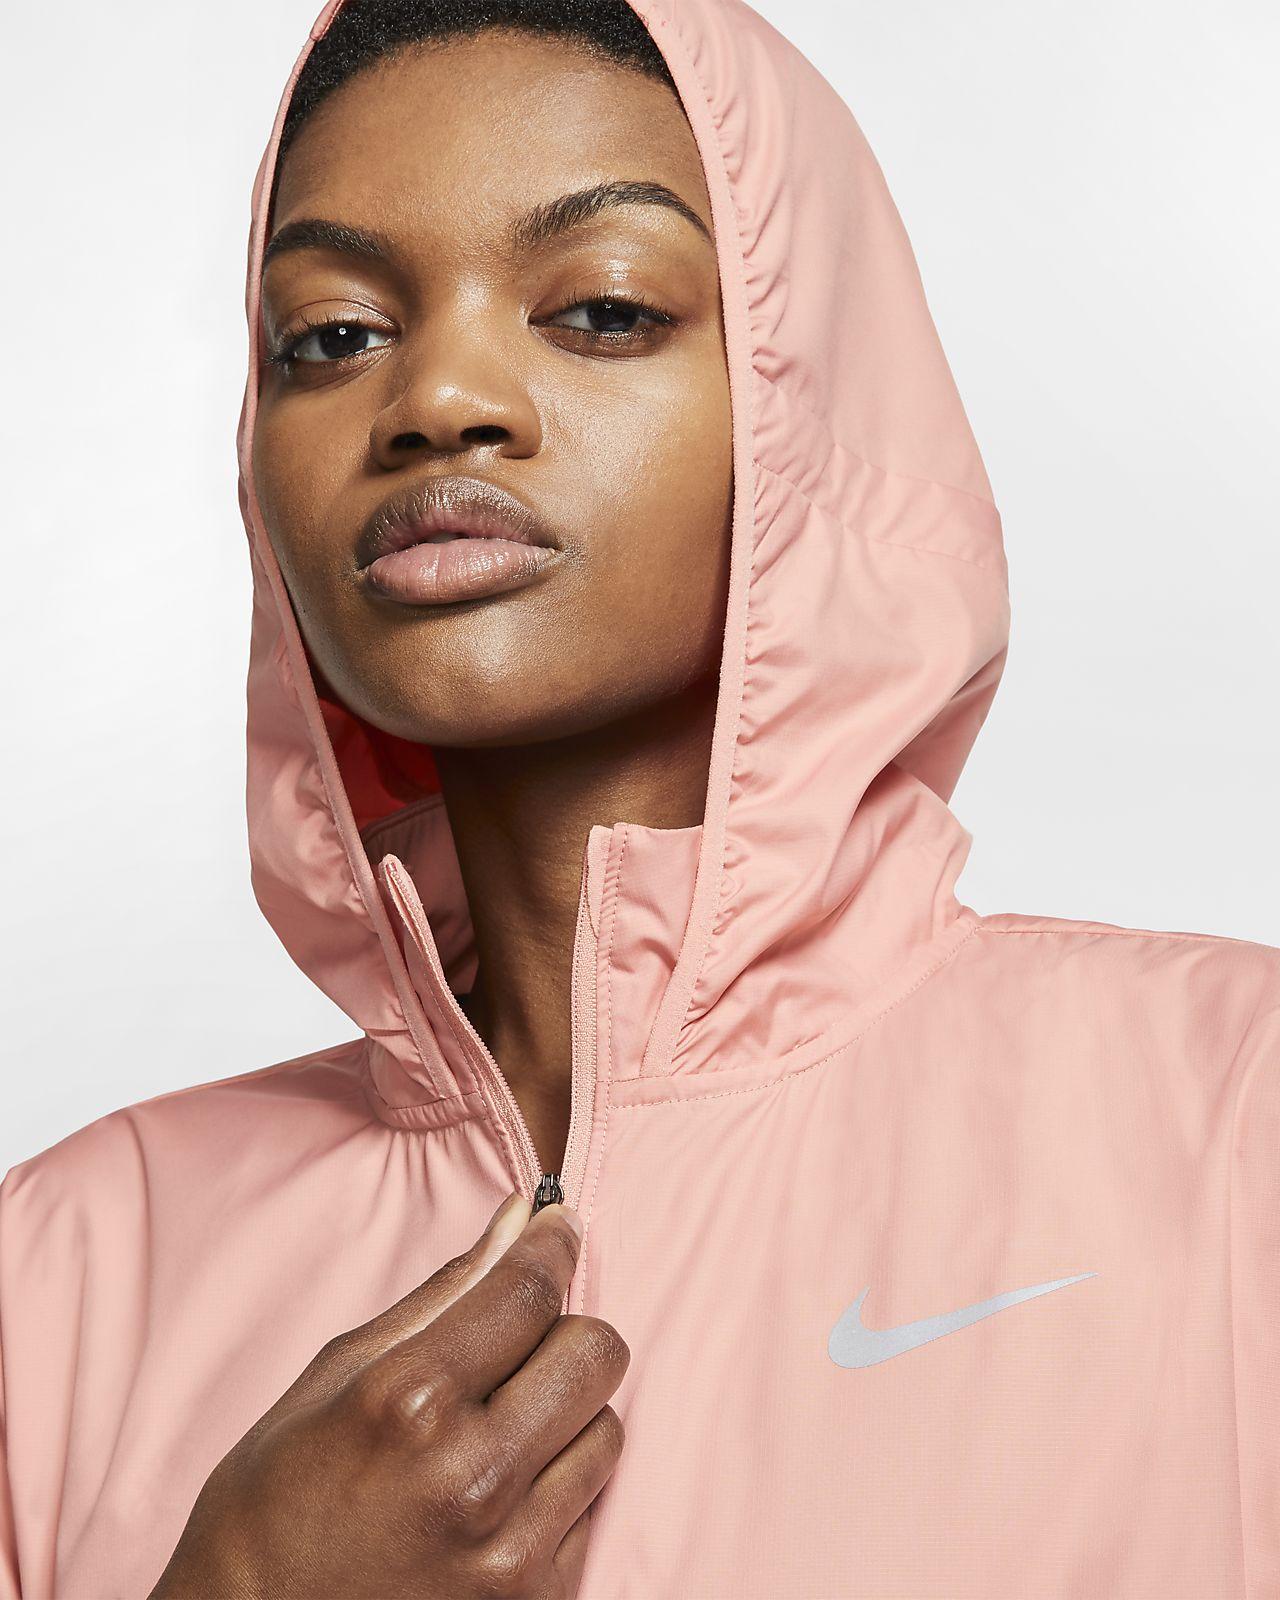 f4cc6b08 Nike Essential nedpakkbar løperegnjakke til dame. Nike.com NO